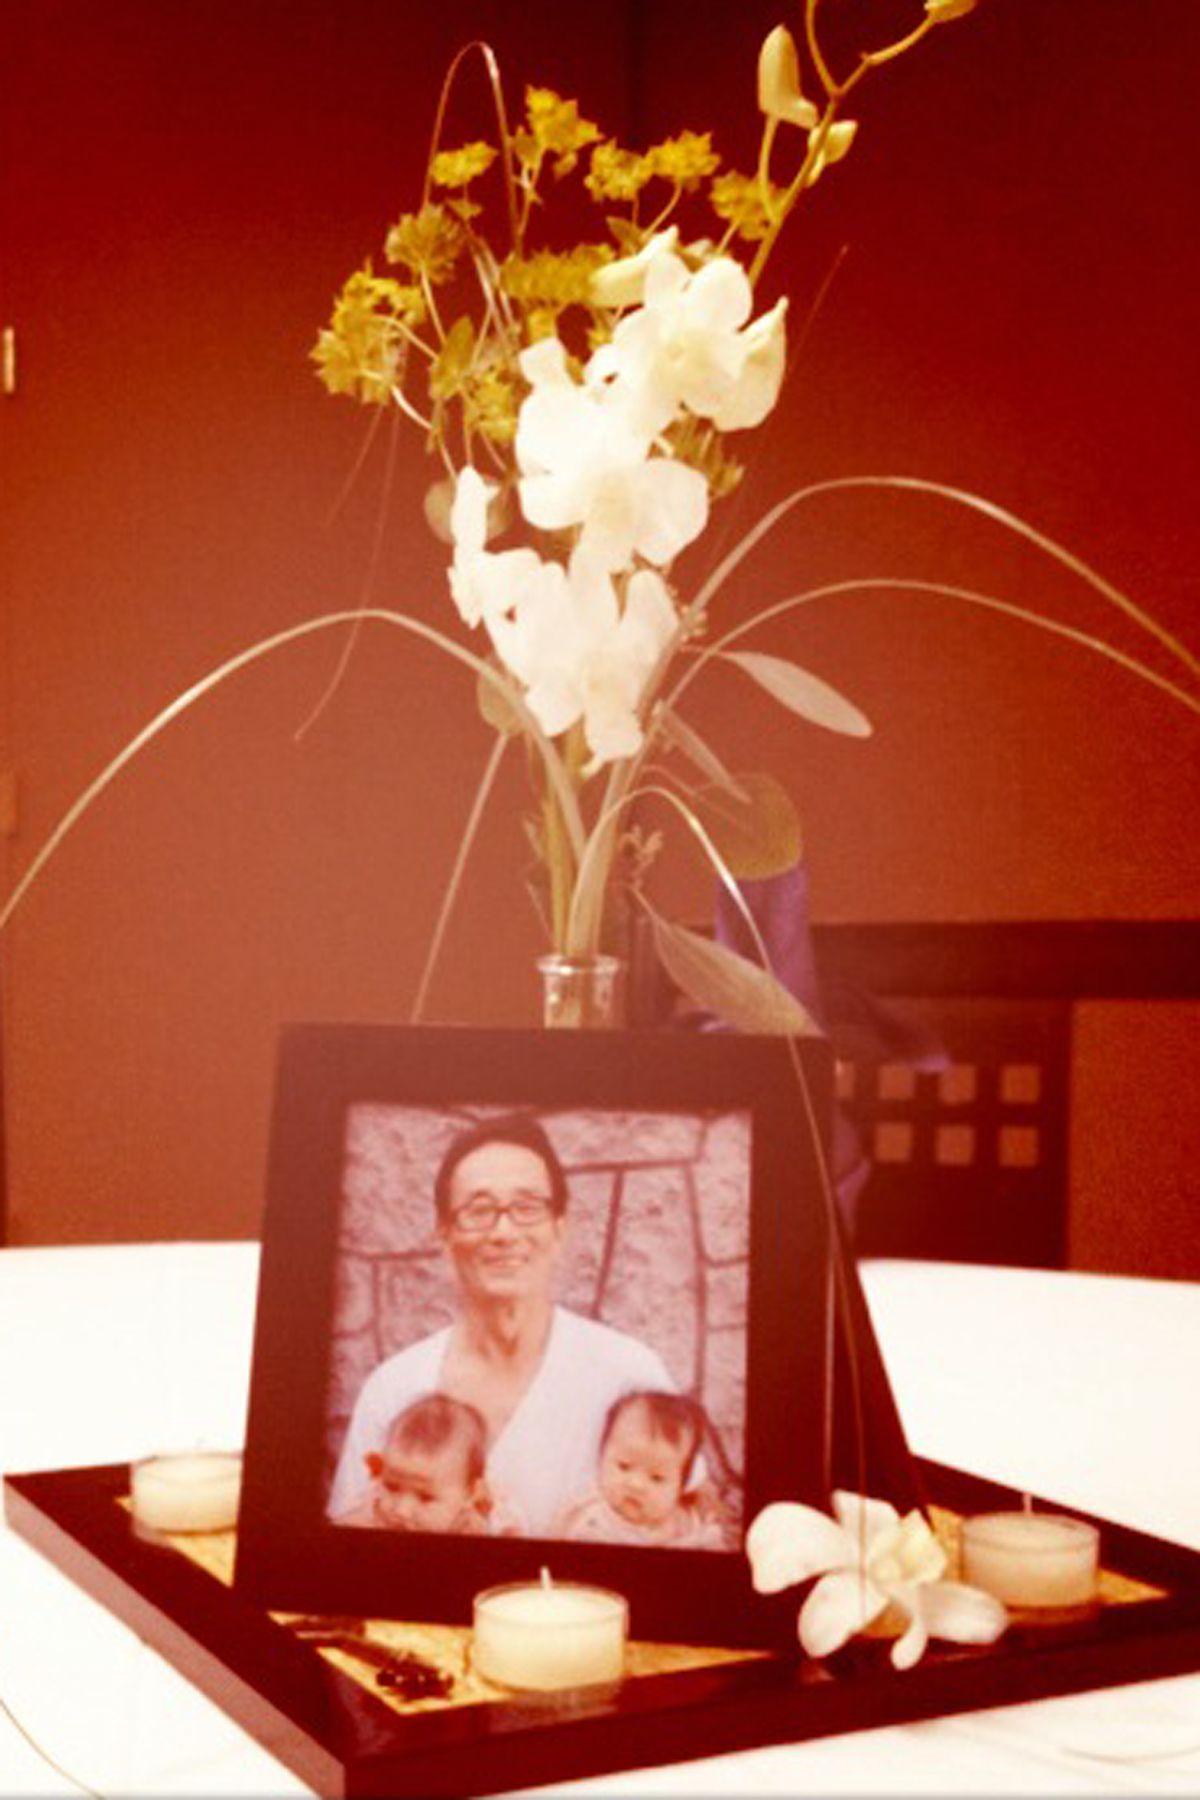 Korean wedding decoration ideas  centerpieces  photos of dad fresh flowers tea light candles keys